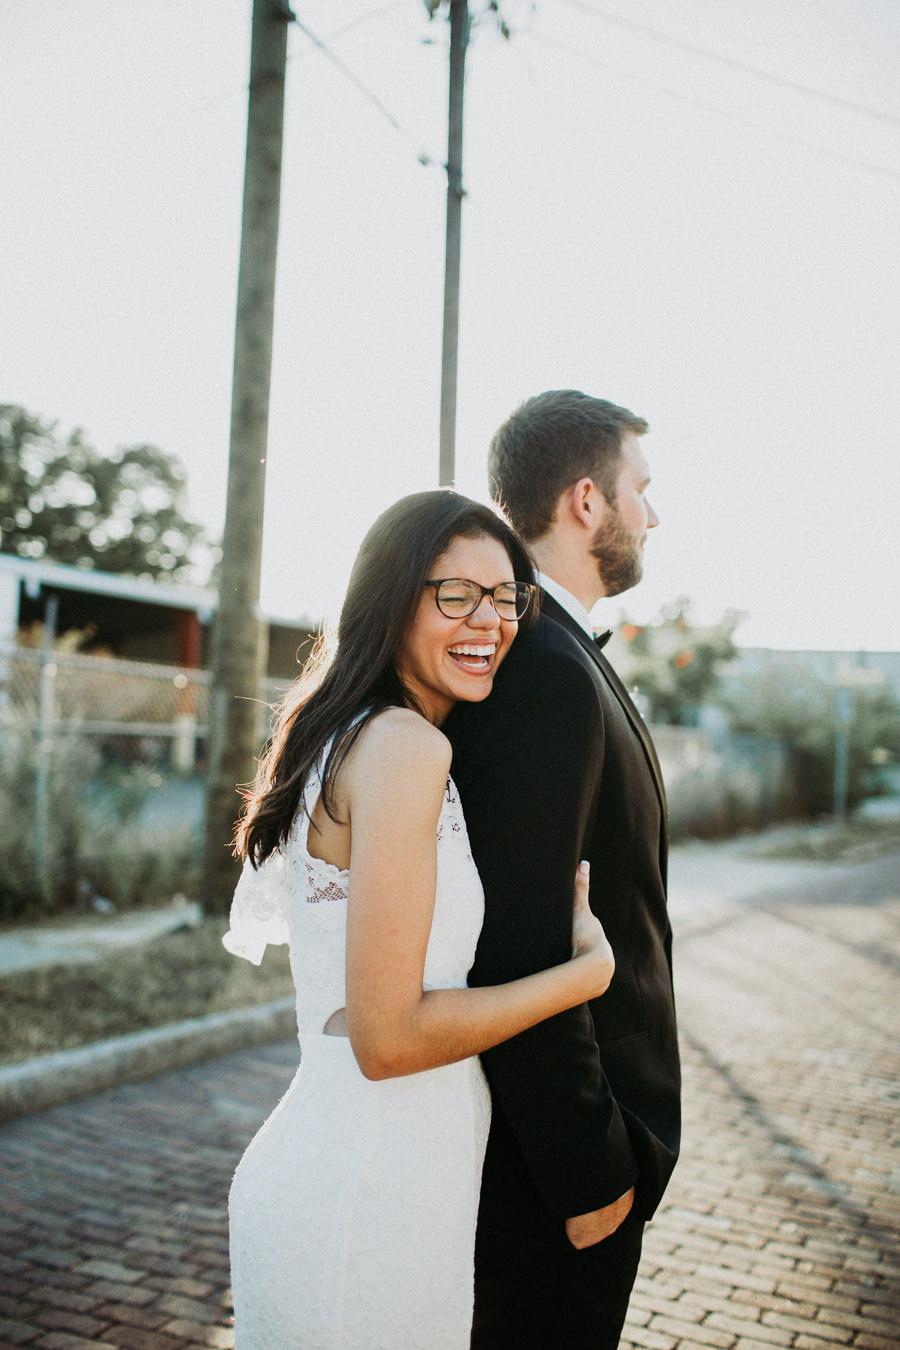 Tampa Heights Industrial Wedding at Cavu Emmy RJ-166.jpg